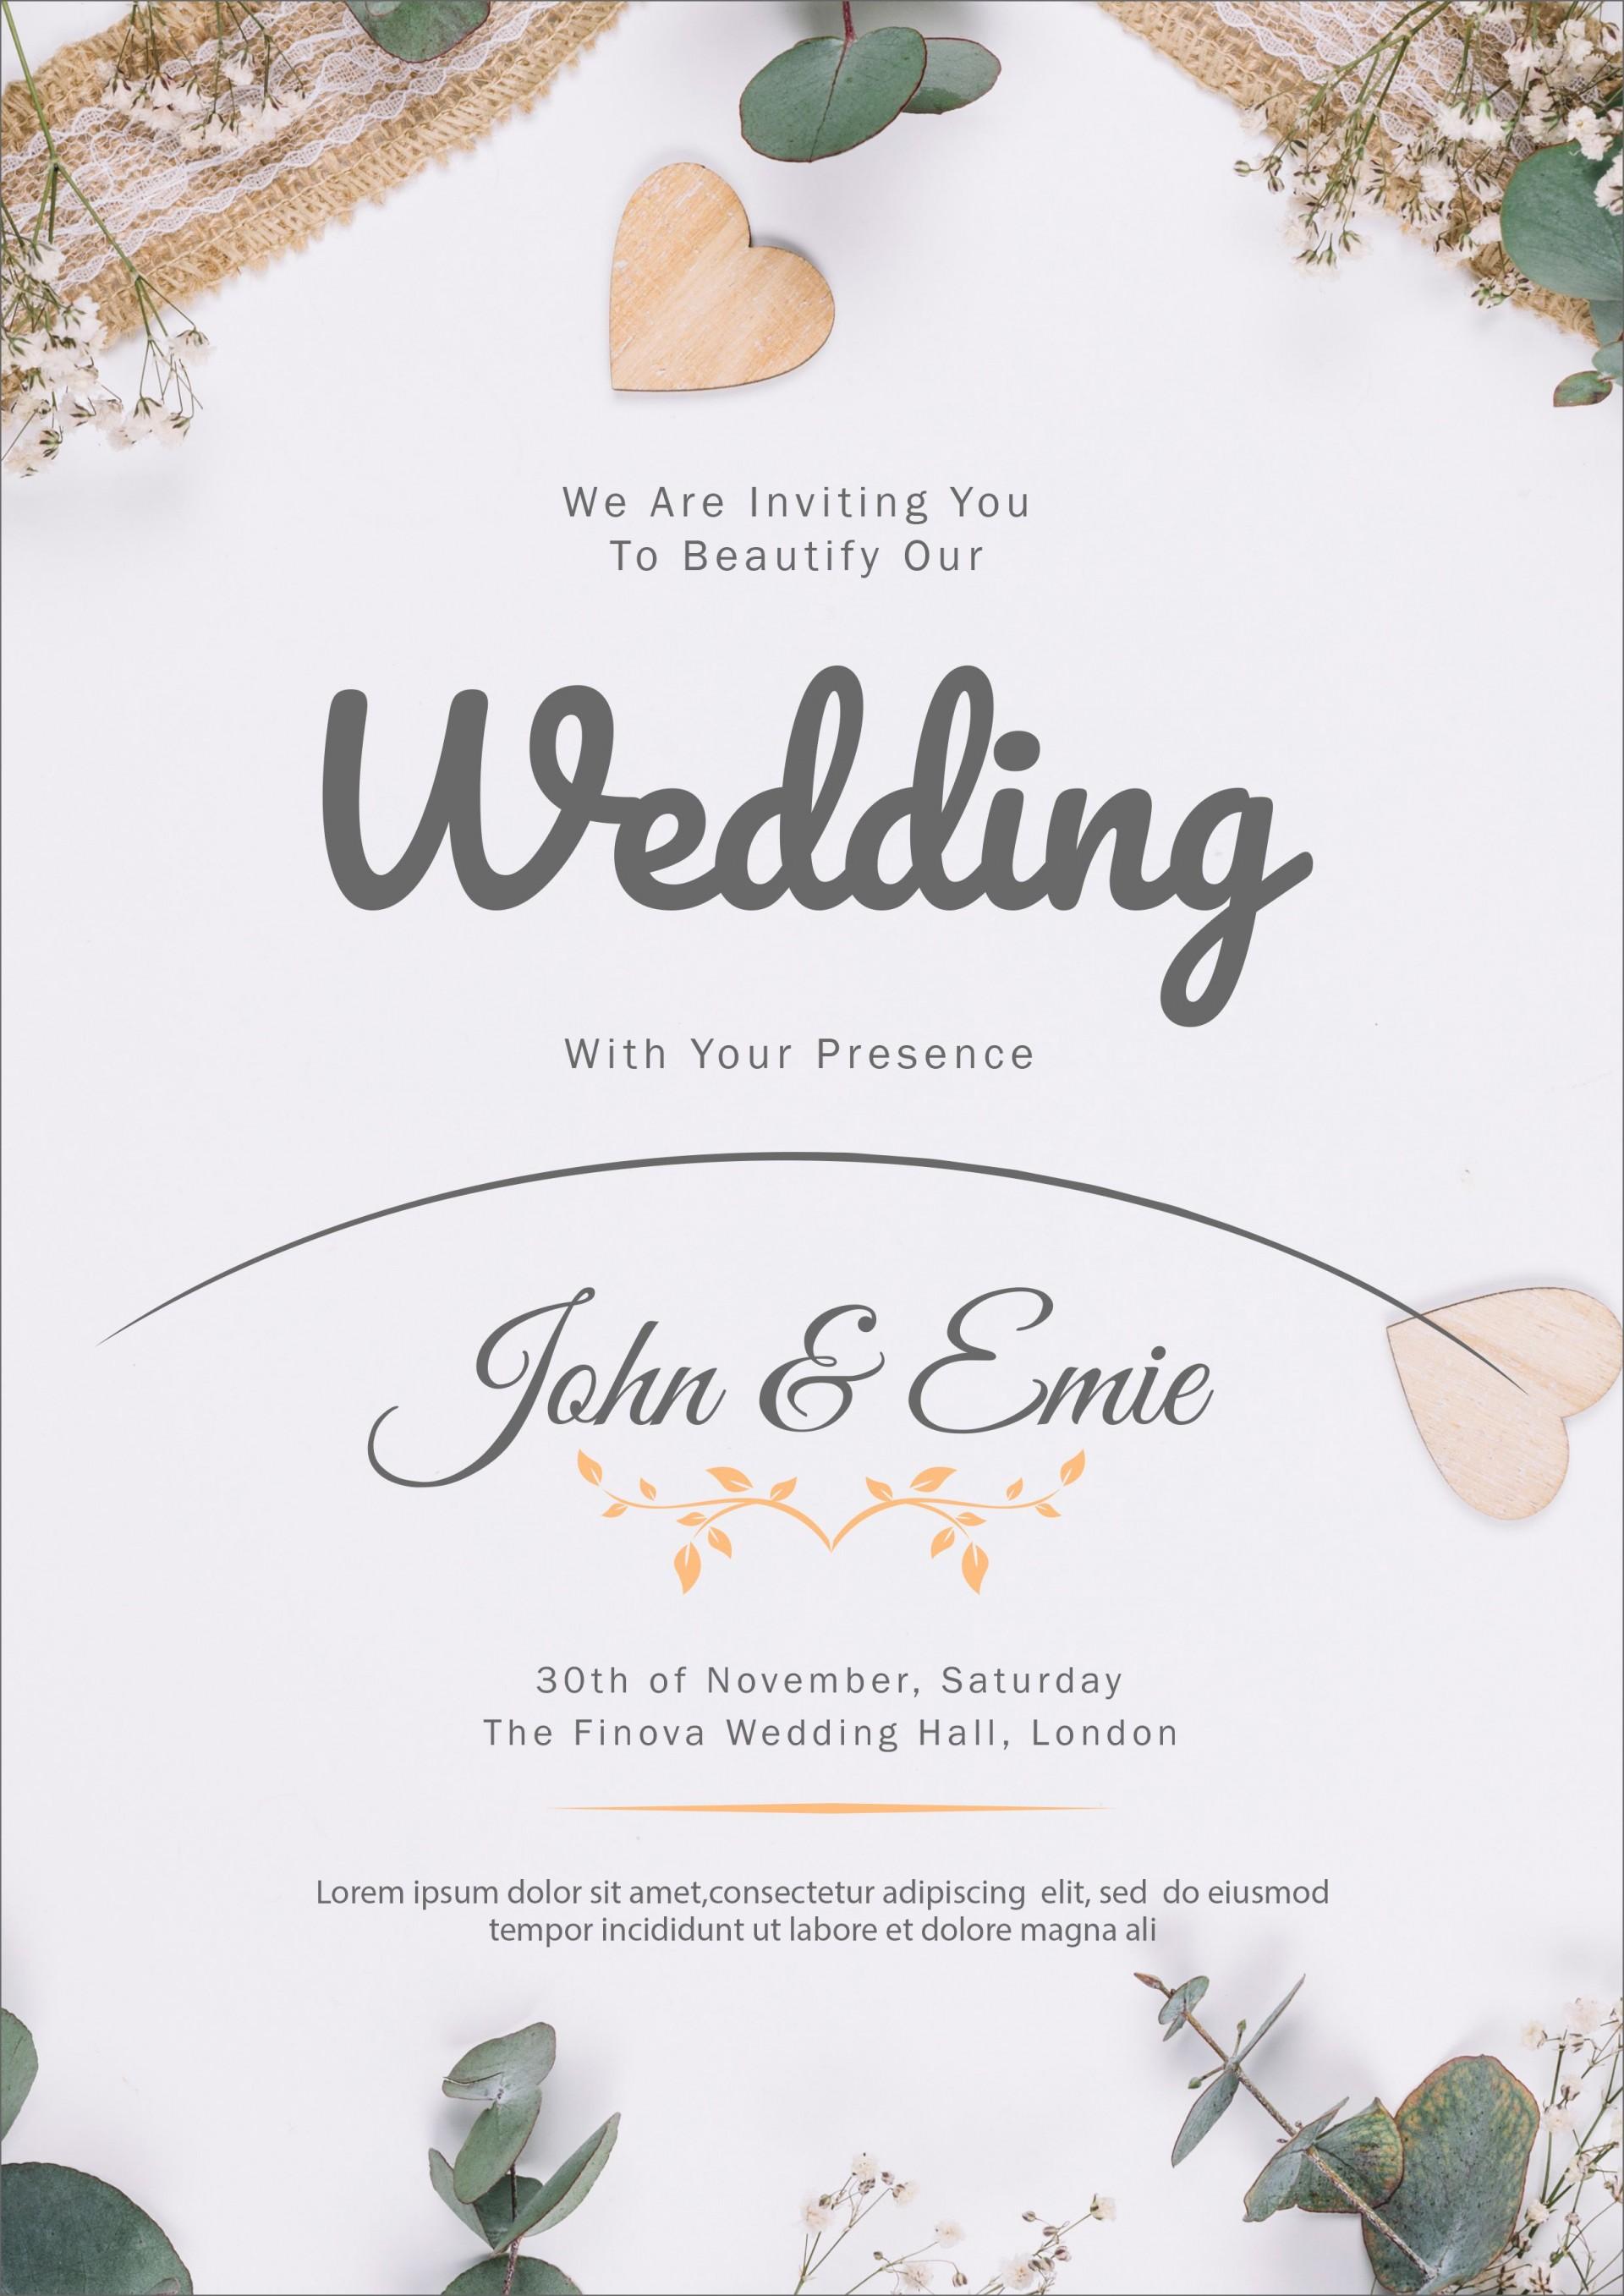 009 Top Sample Wedding Invitation Template High Resolution  Templates Wording Card1920